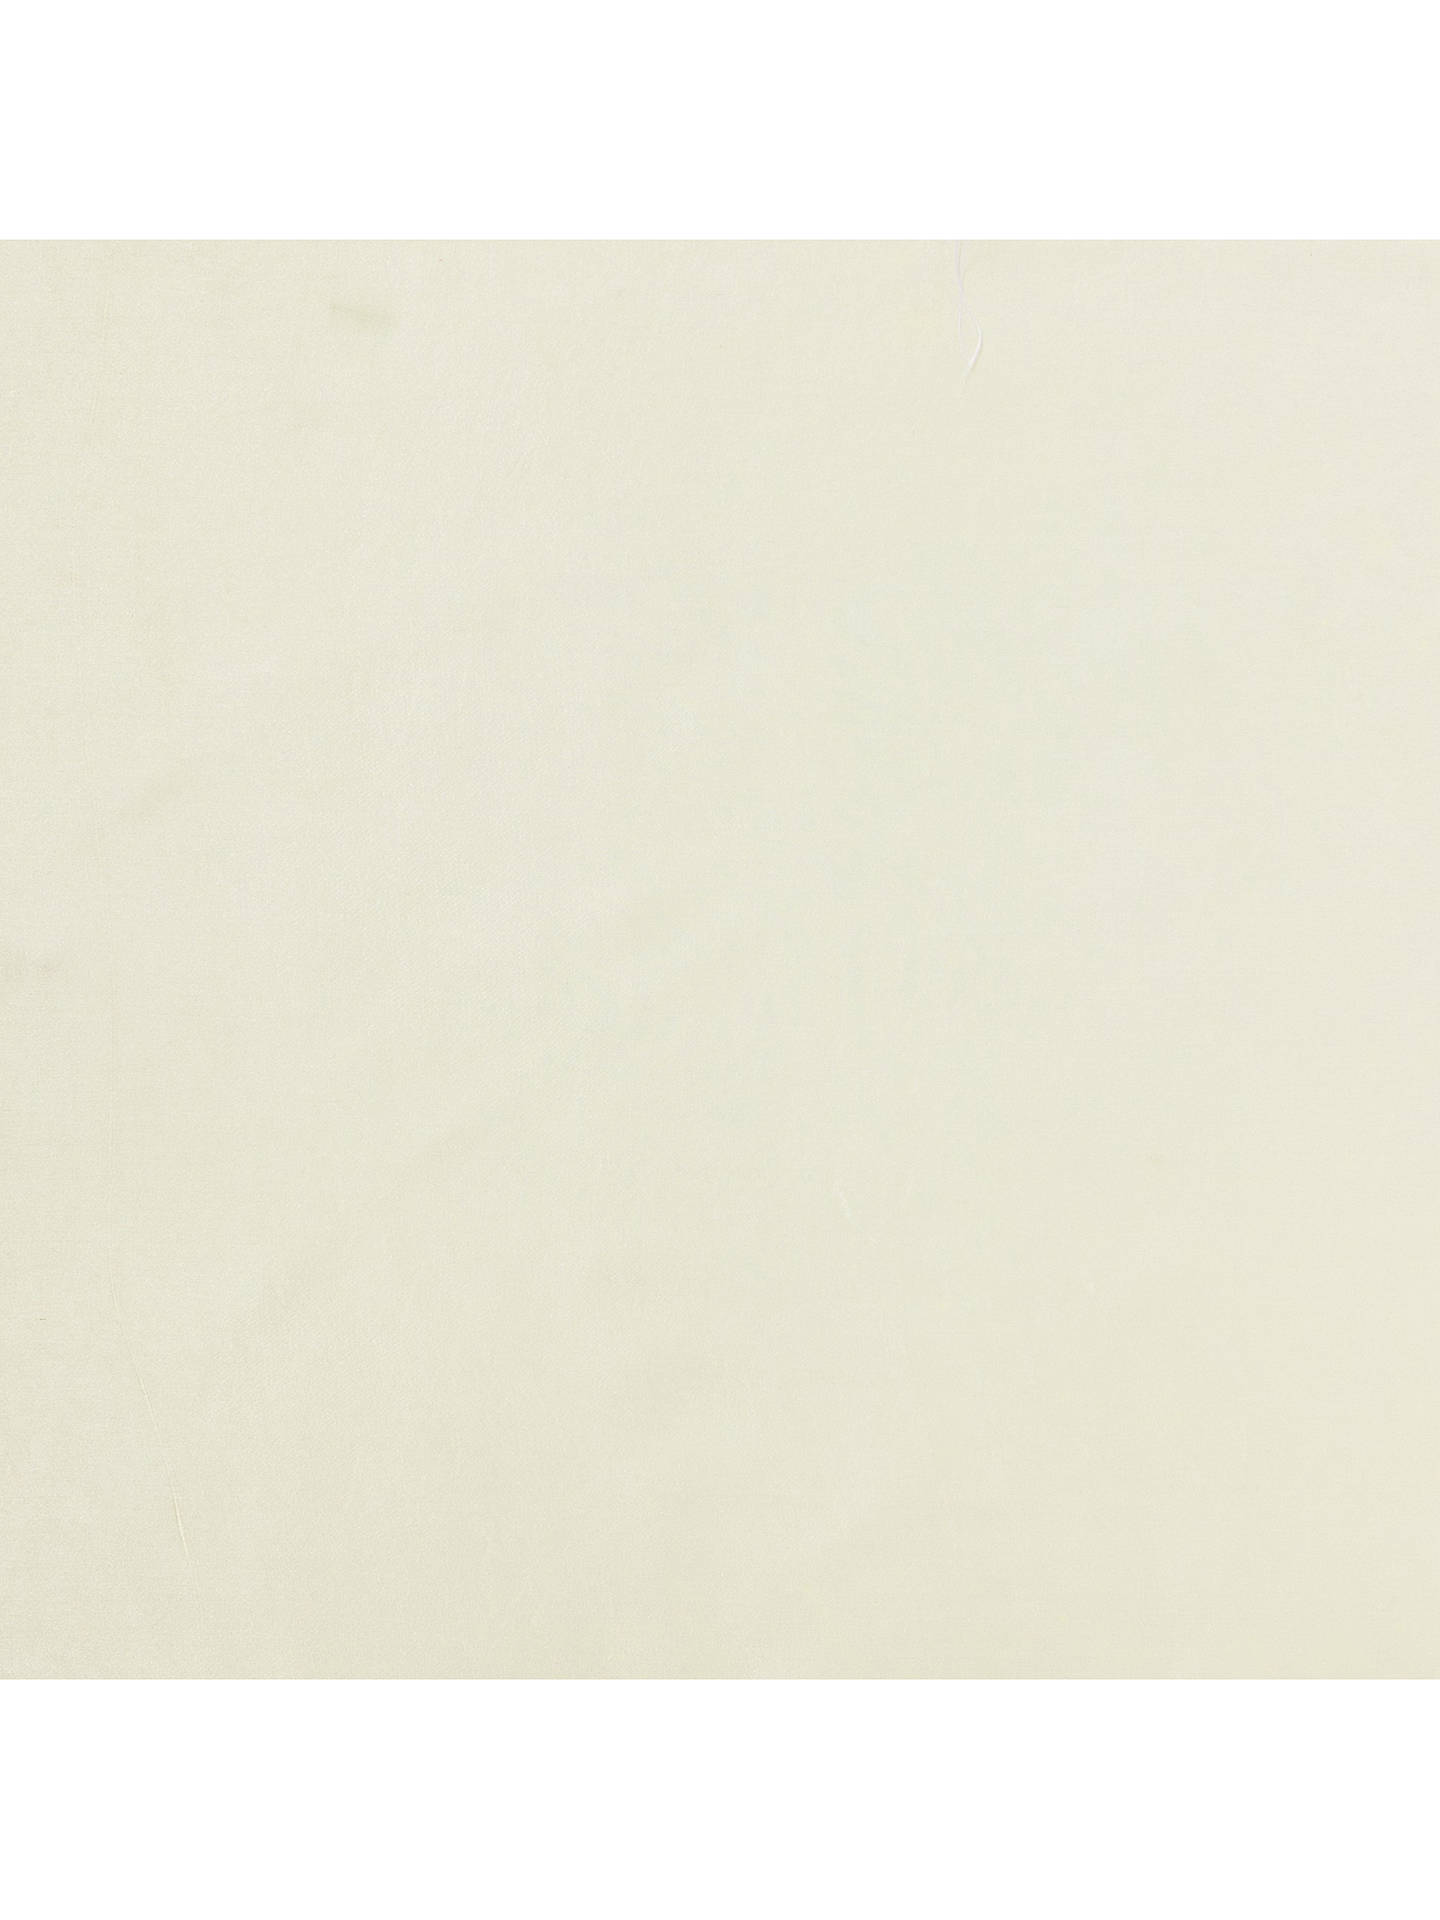 JOHN LEWIS 100/% Silk Satin Dress Fabric CREAM Free P/&P 110cm Wide